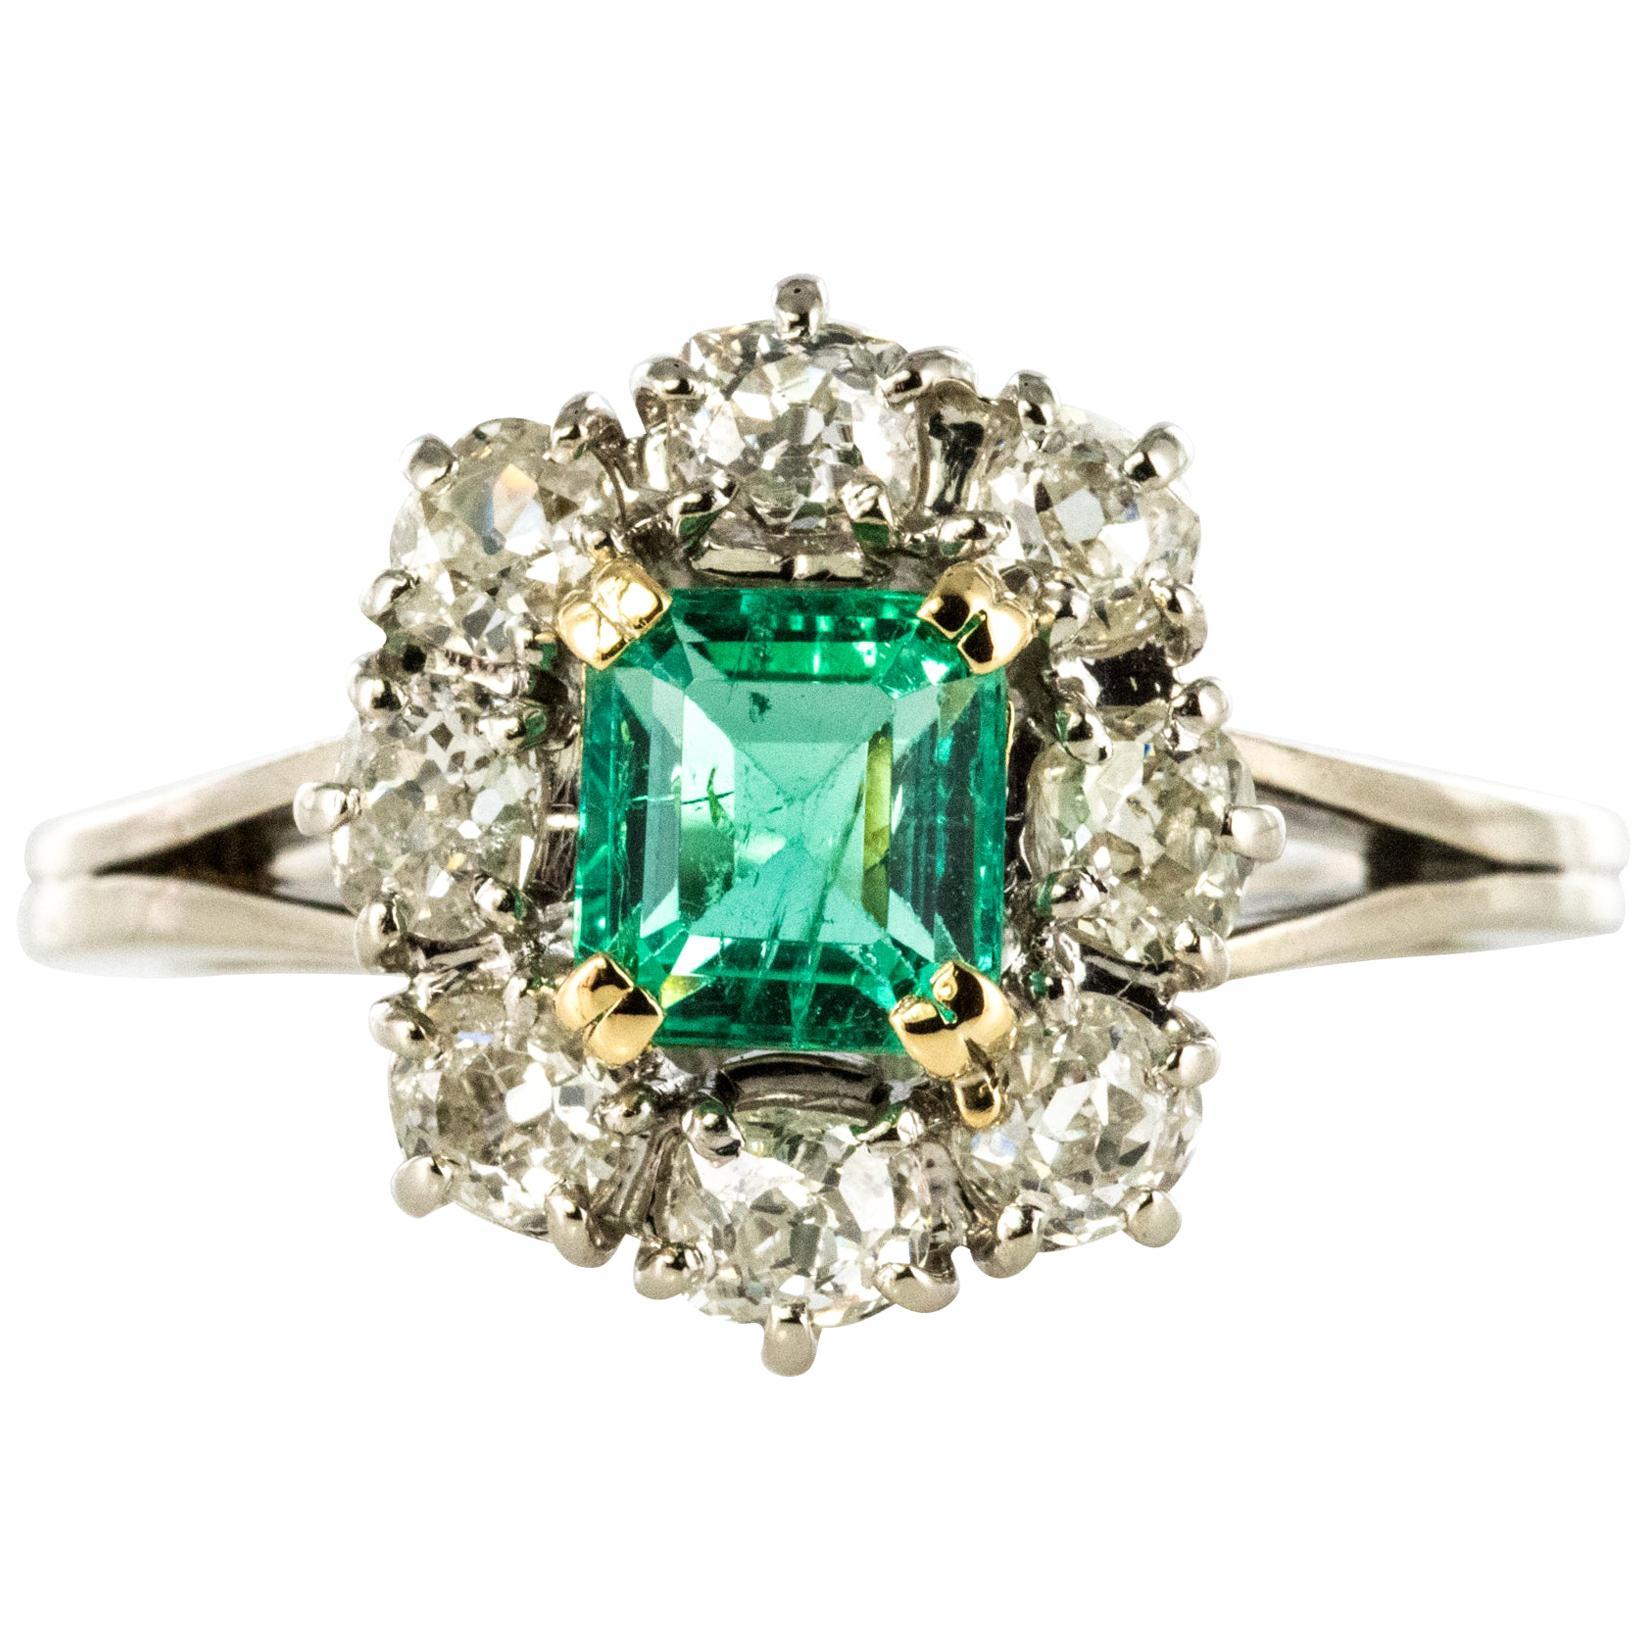 French 1970s Retro Emerald Diamond 18 Karat White Gold Daisy Ring